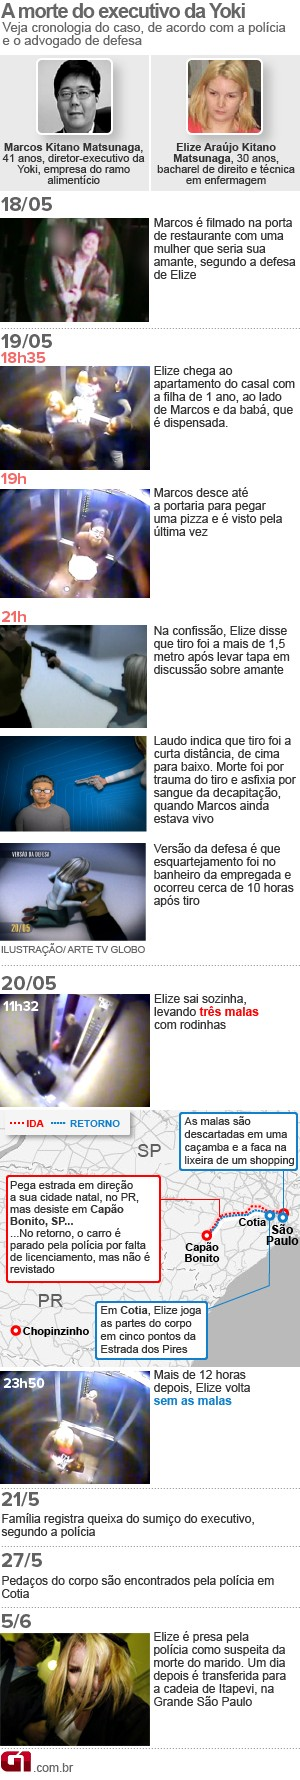 Cronologia Caso Yoki - 15 jun 11h12 (Foto: Arte/G1)